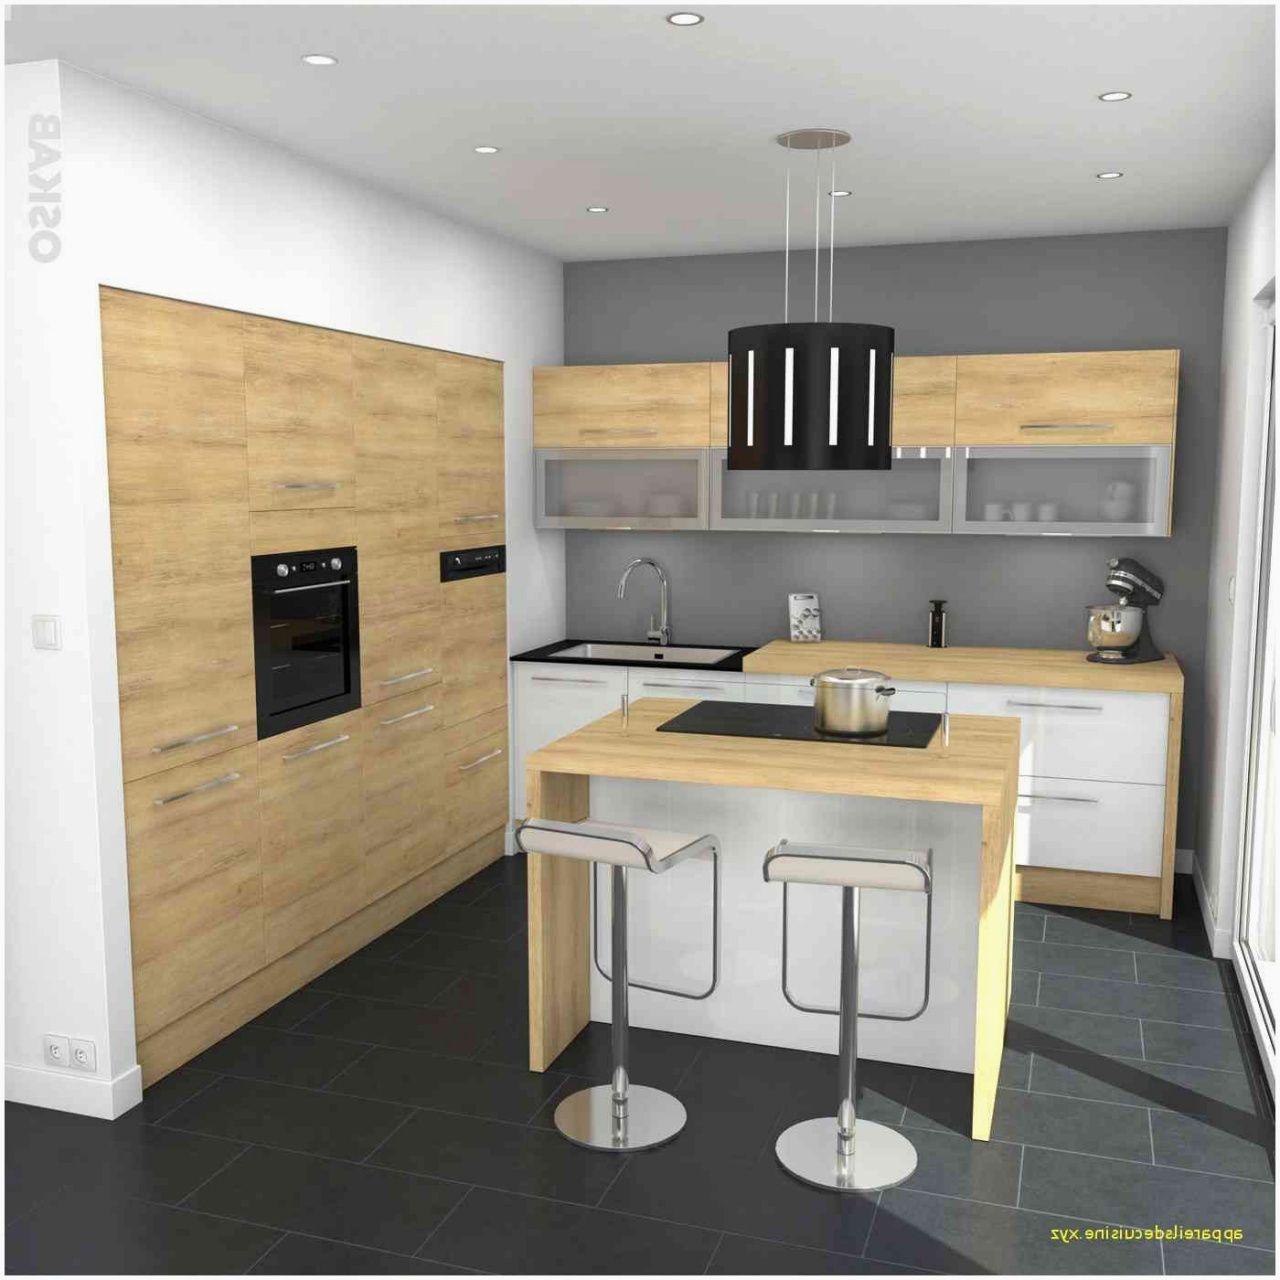 55 Cuisine Taupe Et Noir Cuisines Design Meuble Cuisine Cuisine Moderne